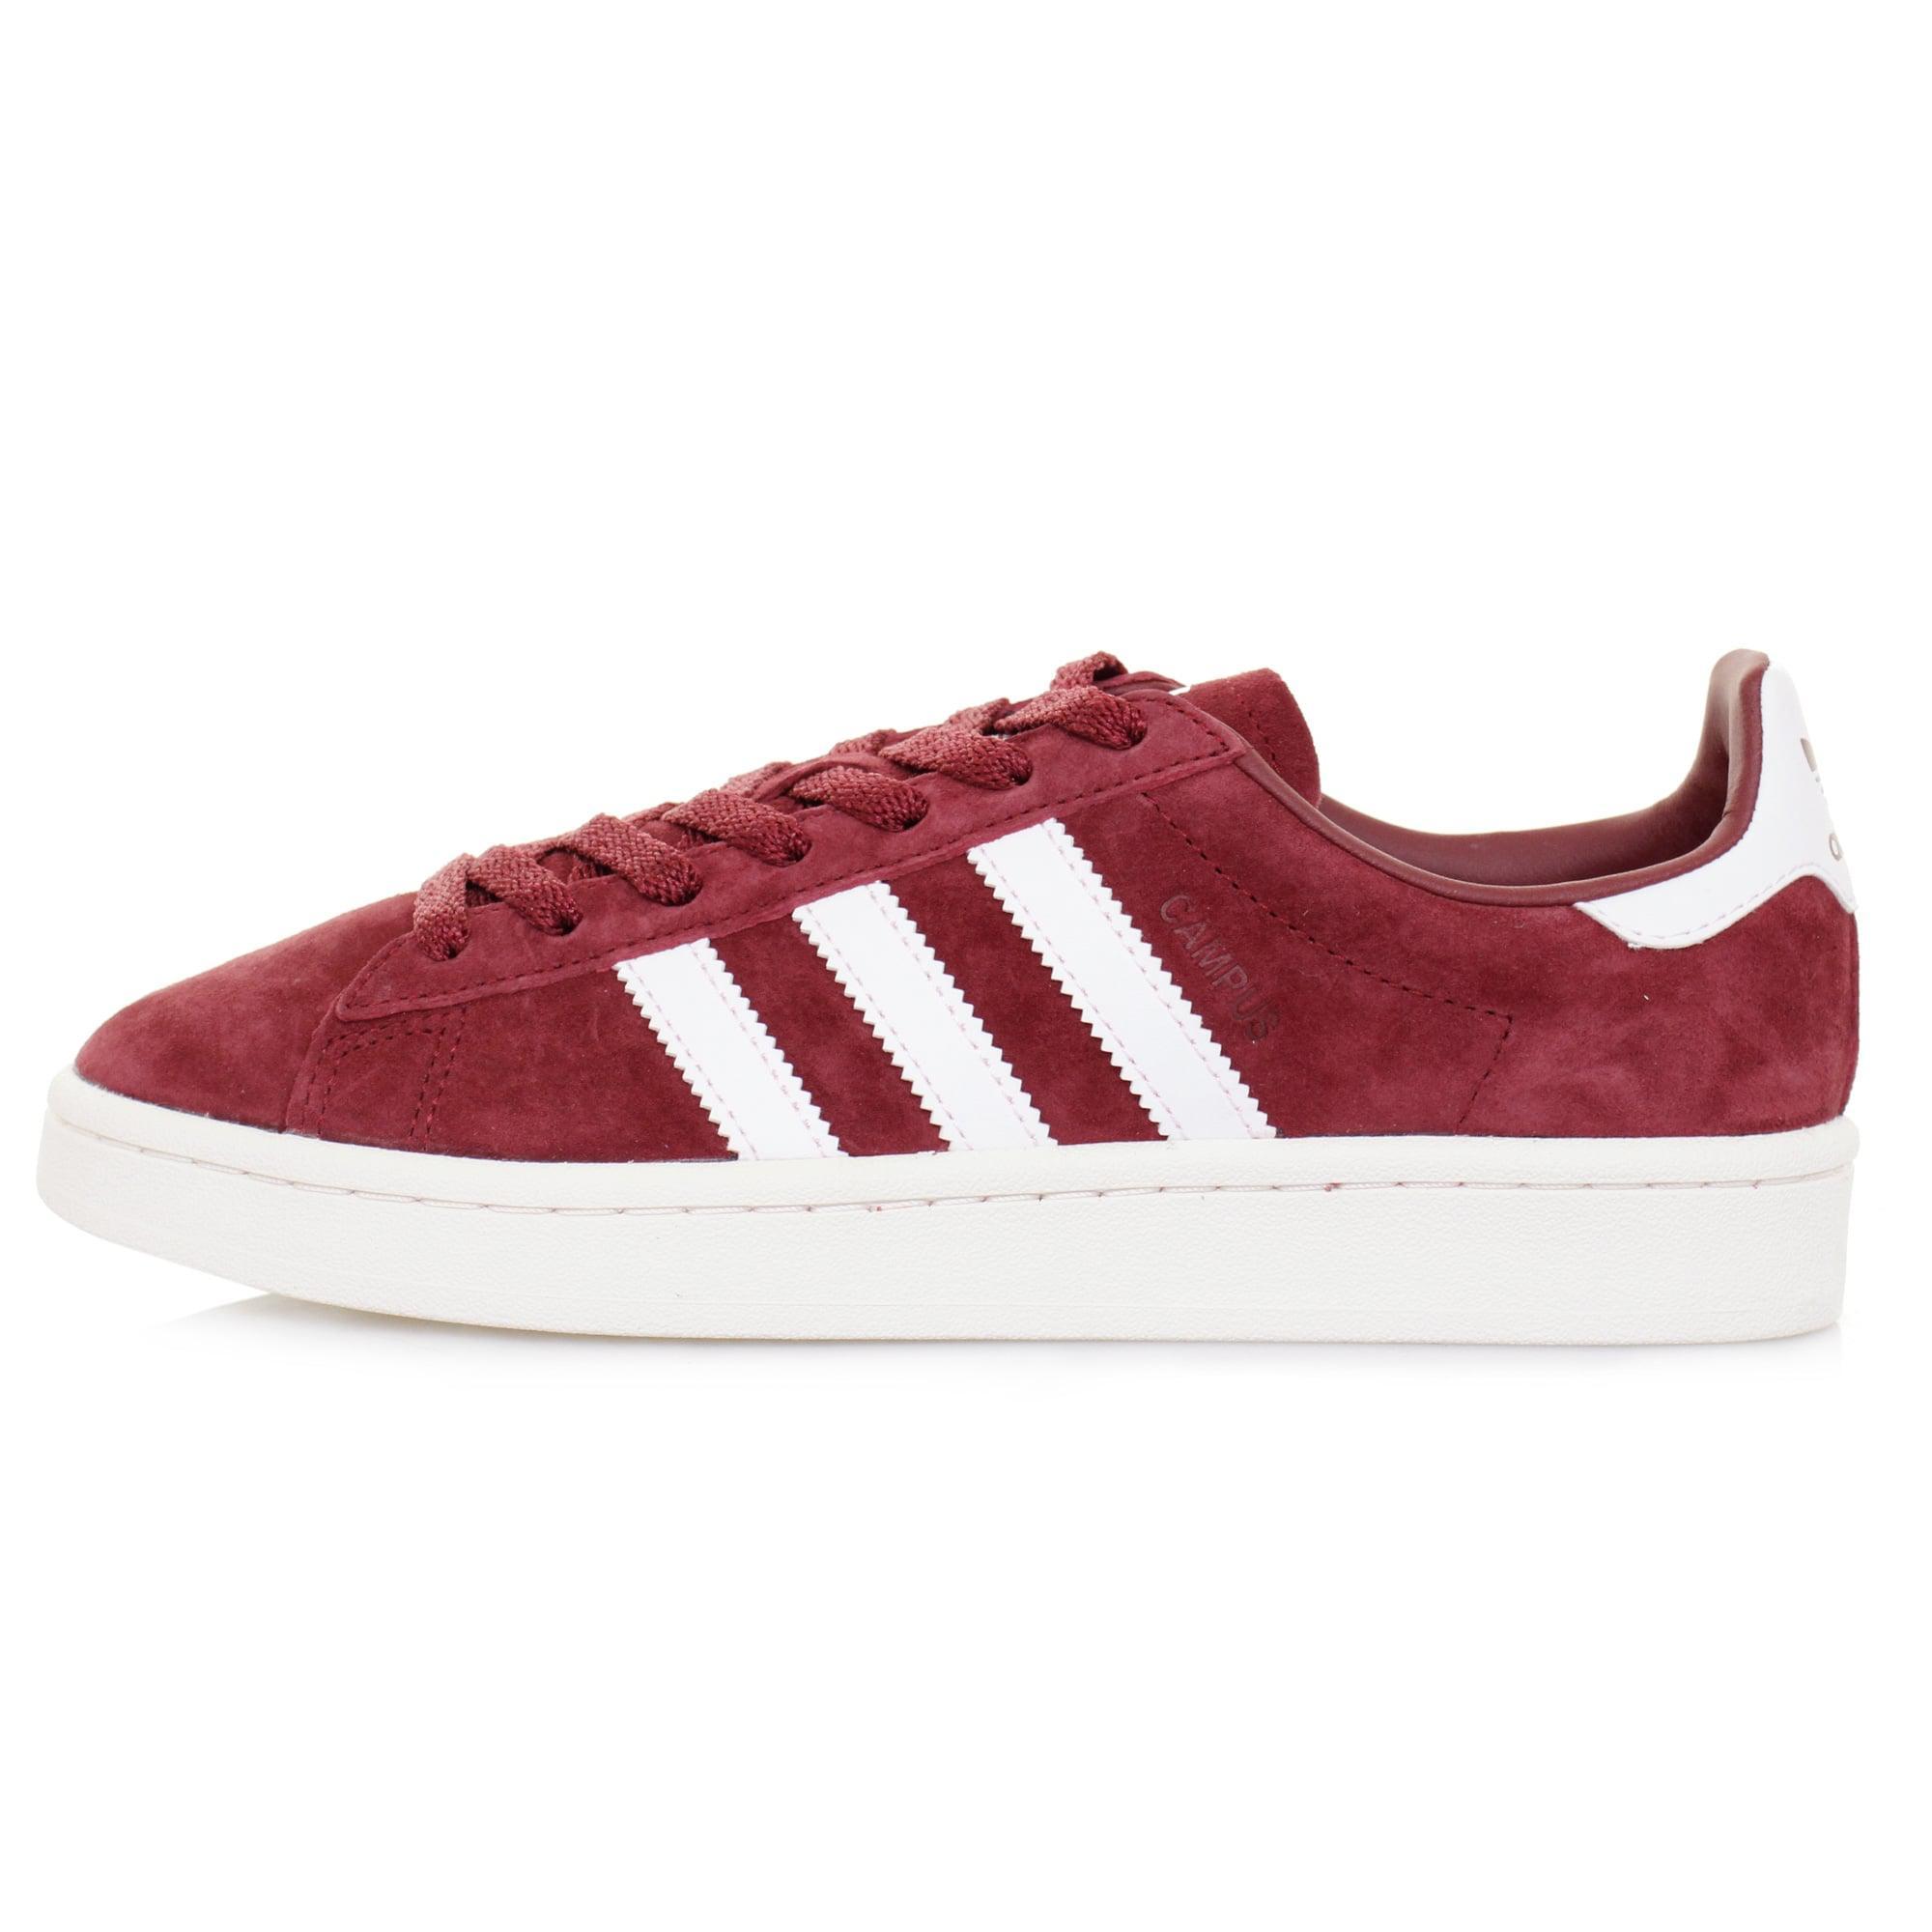 Adidas Originals Adidas Campus Burgundy Shoe In Red For